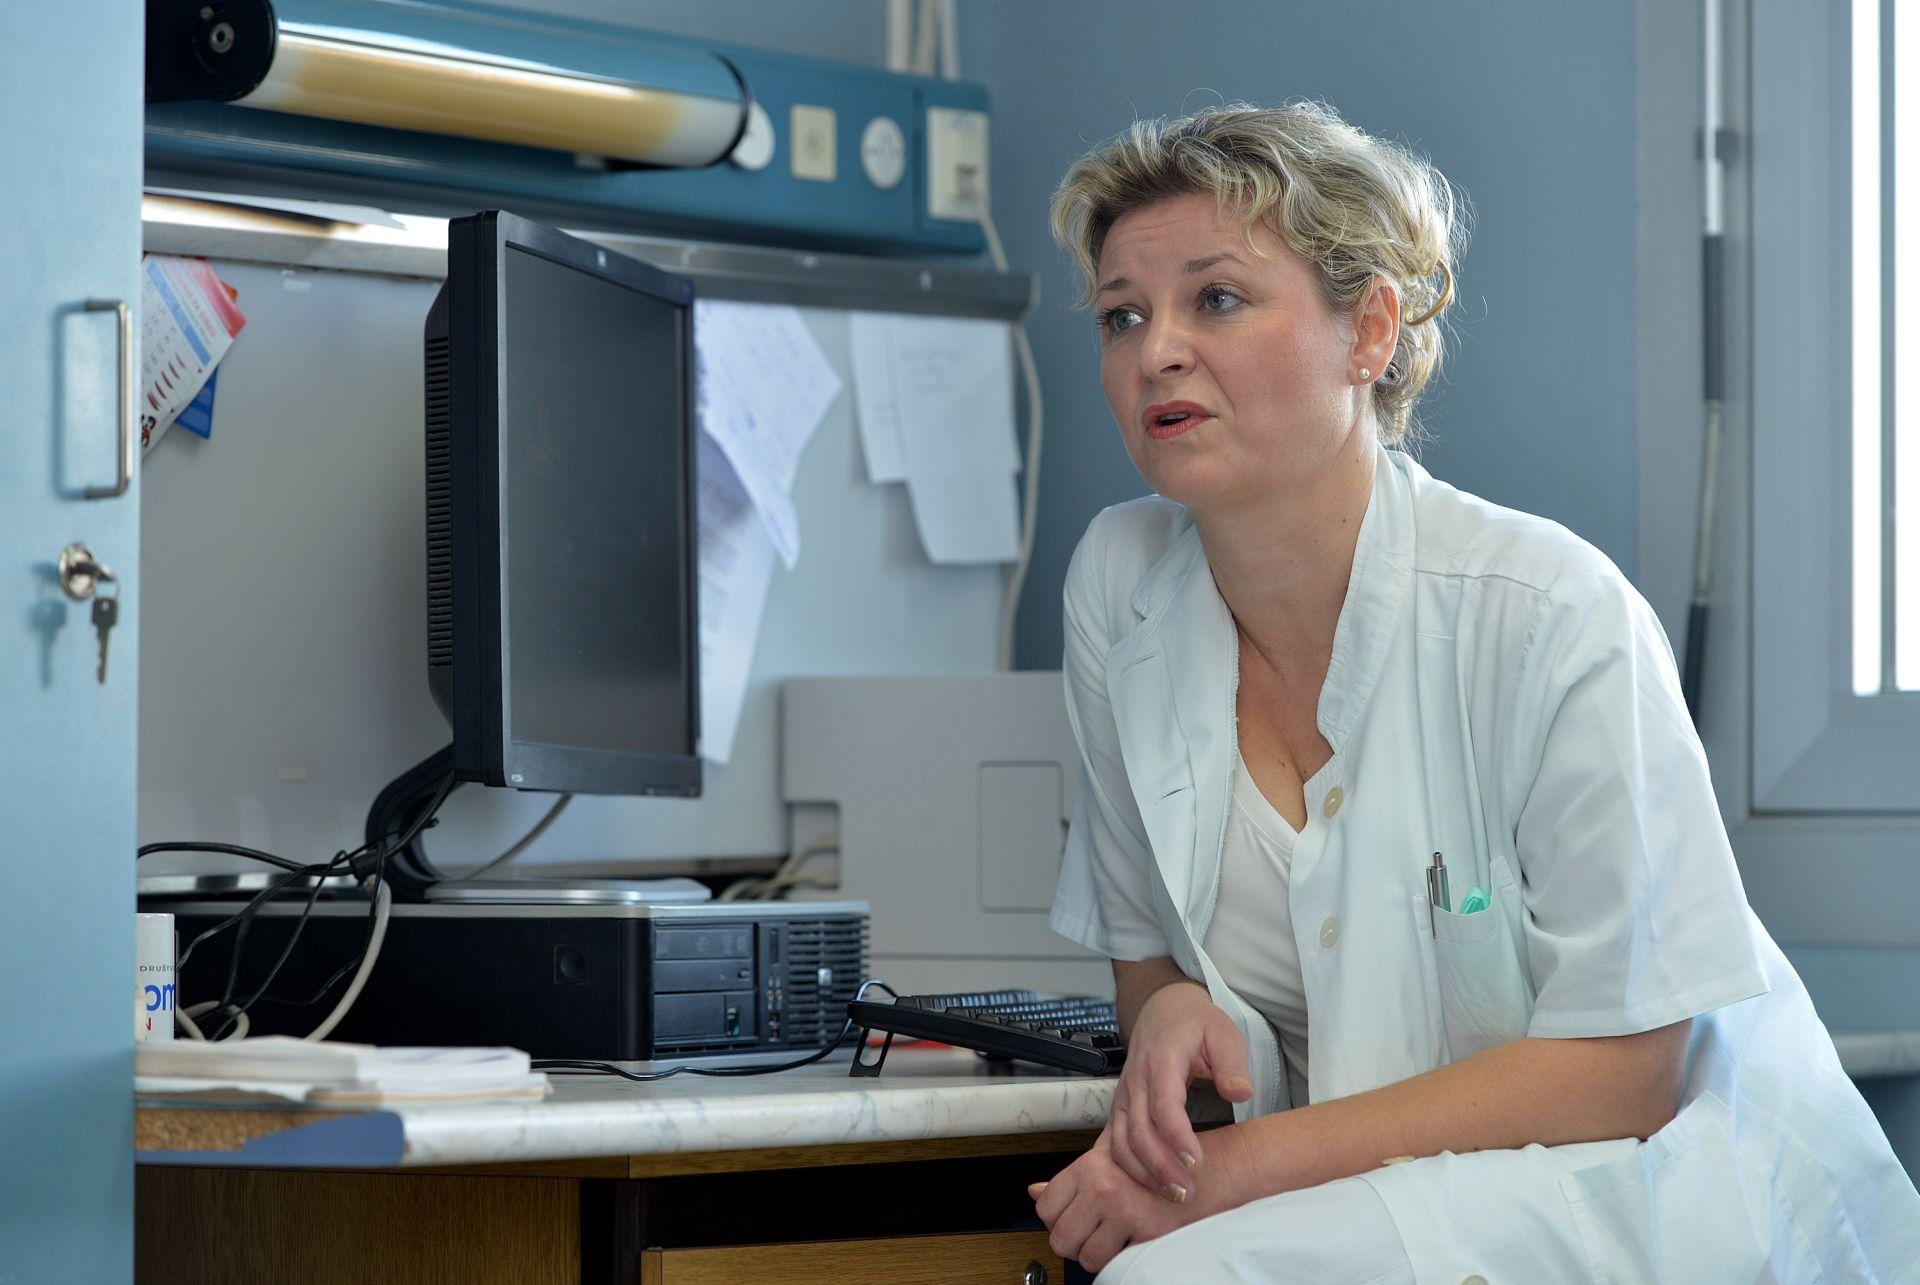 Stručno vijeće varaždinske bolnice dalo podršku ravnateljici